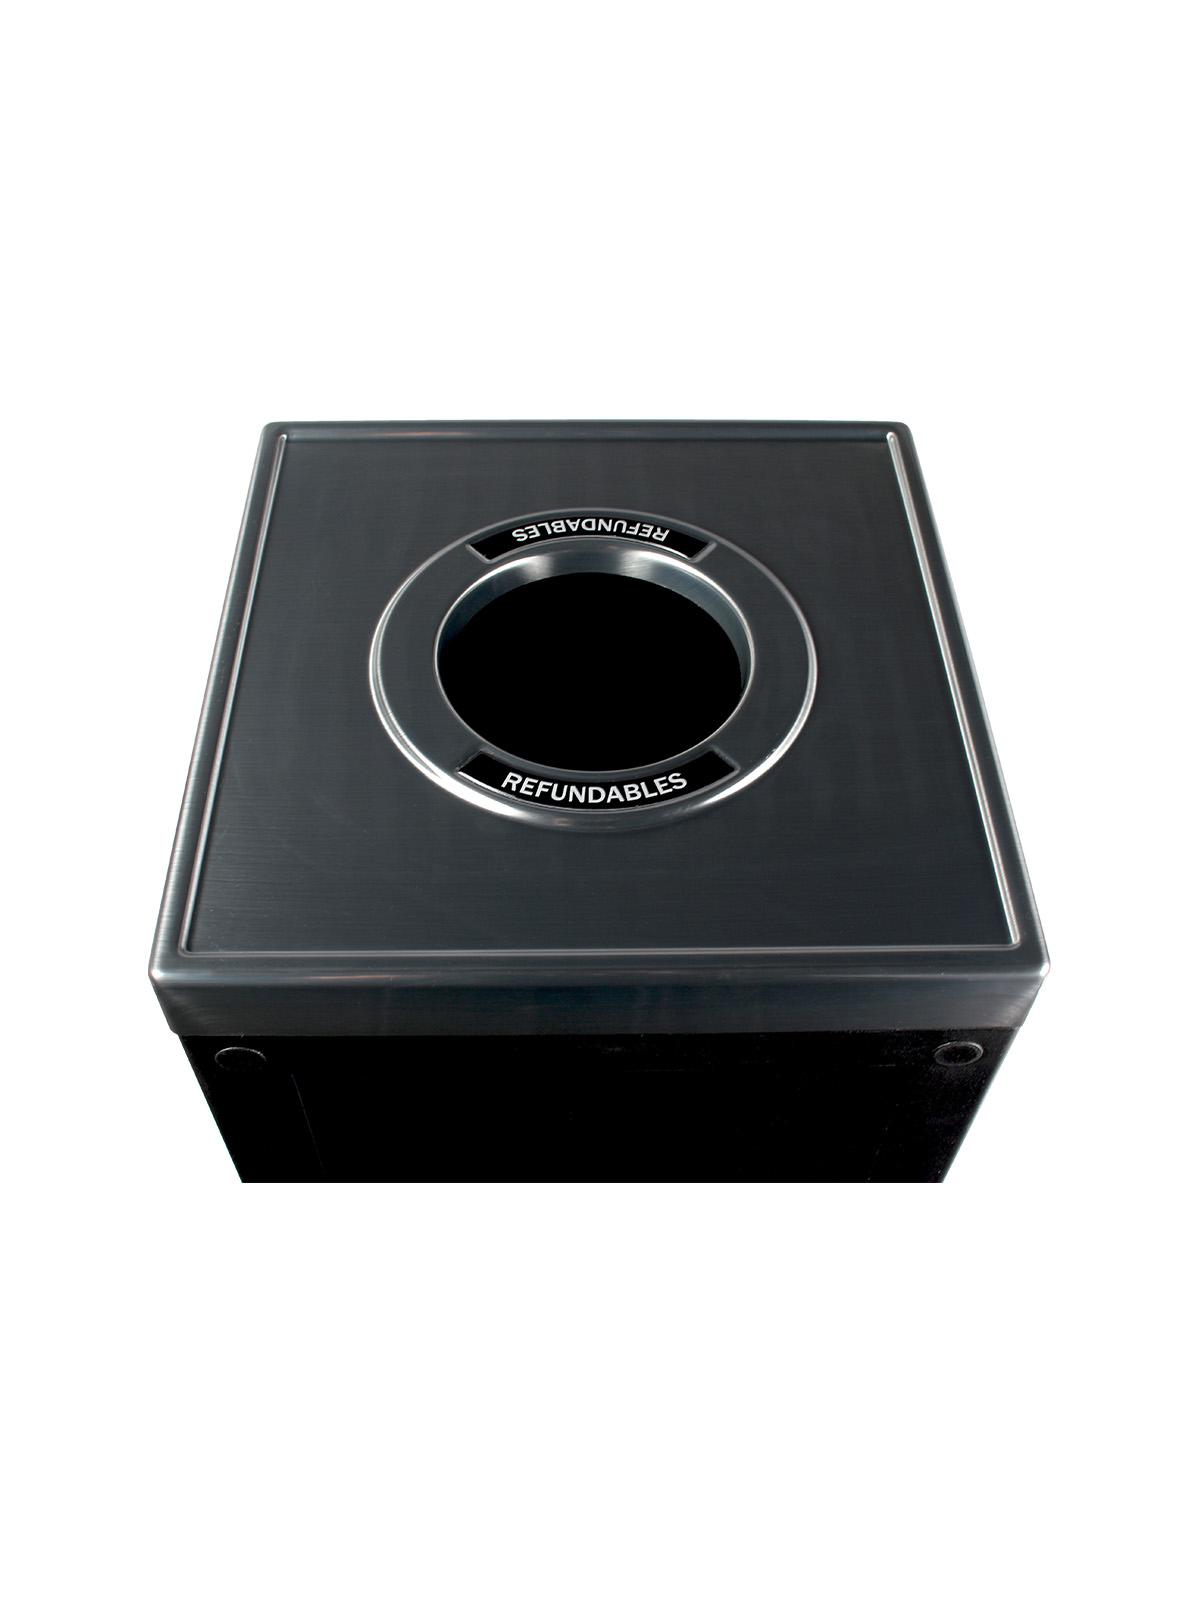 EVOLVE - Single - Refundables - Circle - Black